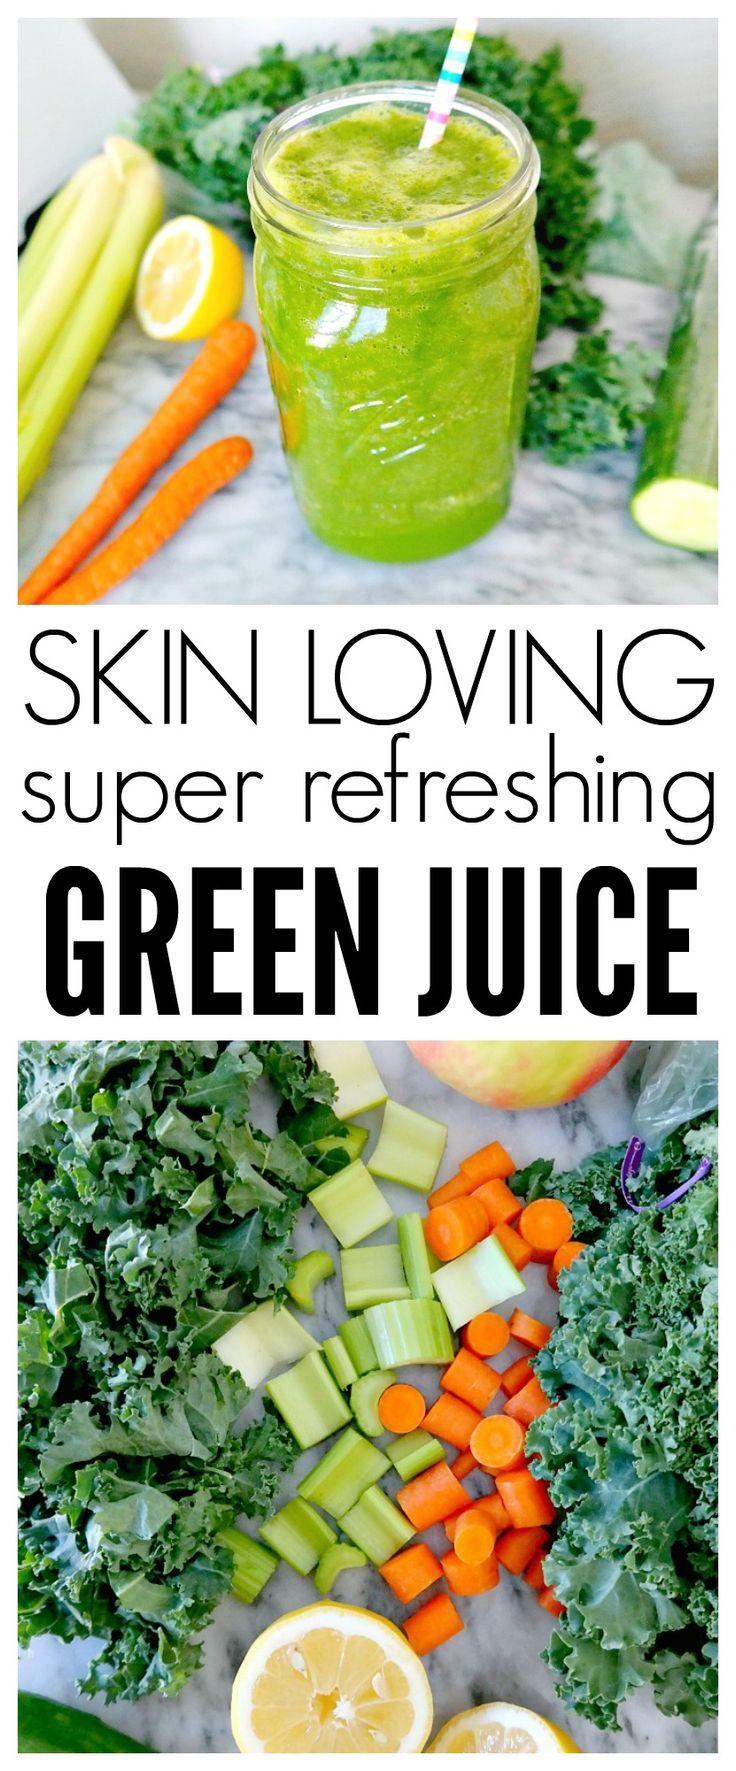 recipe: green juice recipe for skin [34]